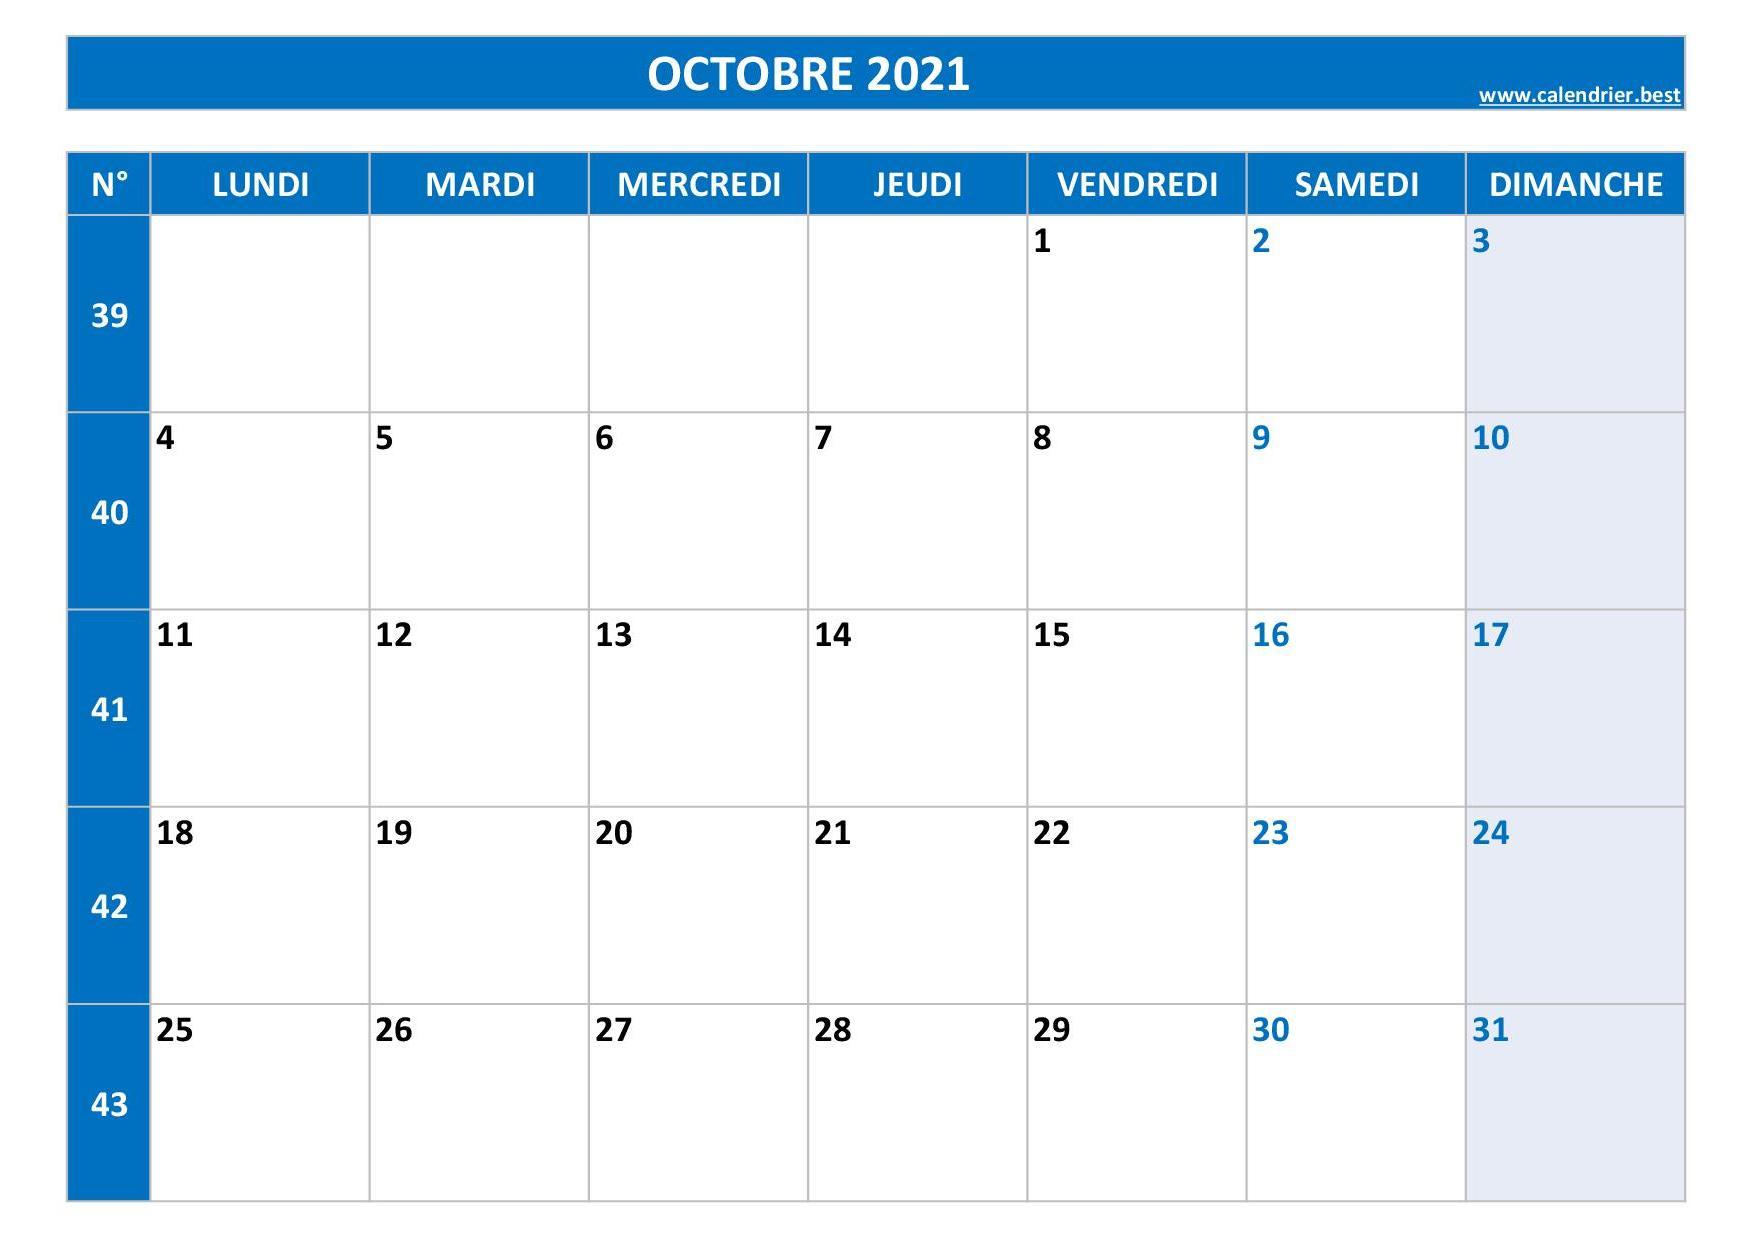 Calendrier Octobre 2021 à consulter ou imprimer  Calendrier.best